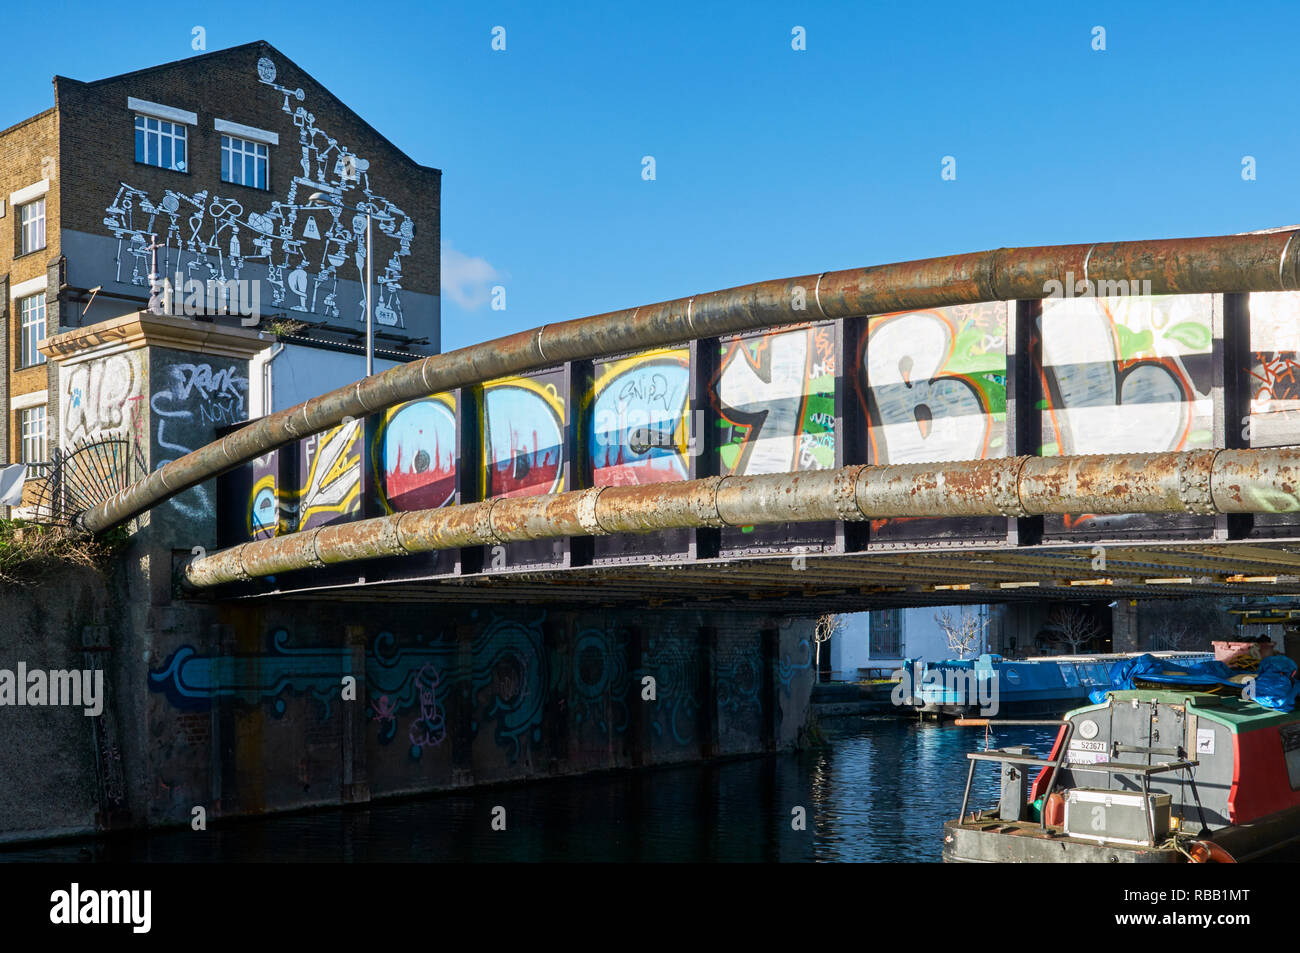 Bridge with graffiti over the River Lea Navigation at Hackney Wick, East London UK - Stock Image